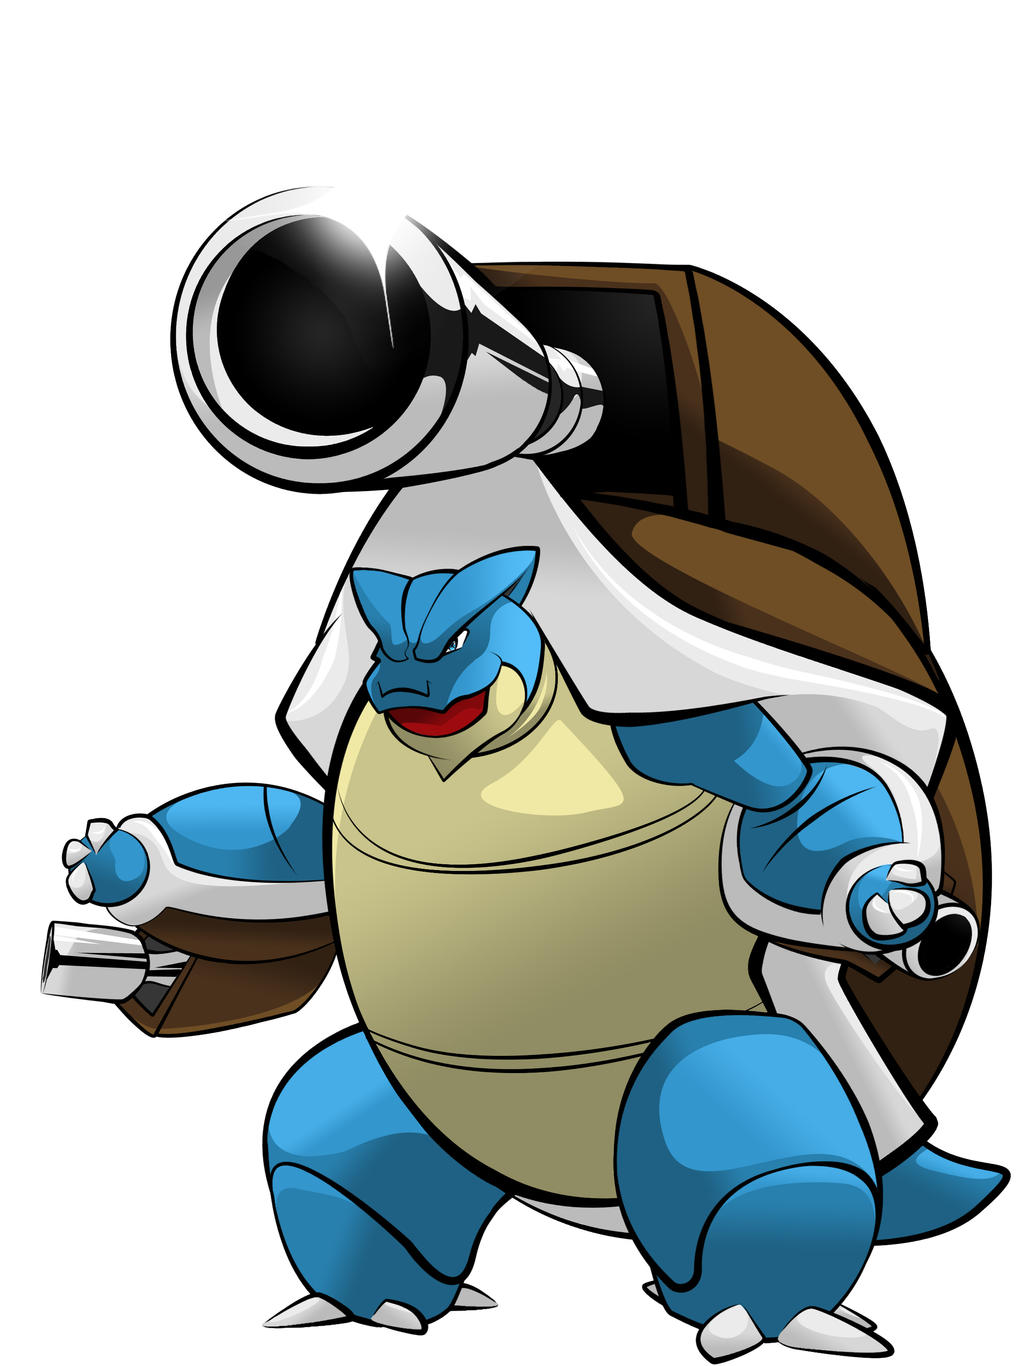 Mega blastoise by exteam001 on deviantart - Pokemon tortank mega evolution ...